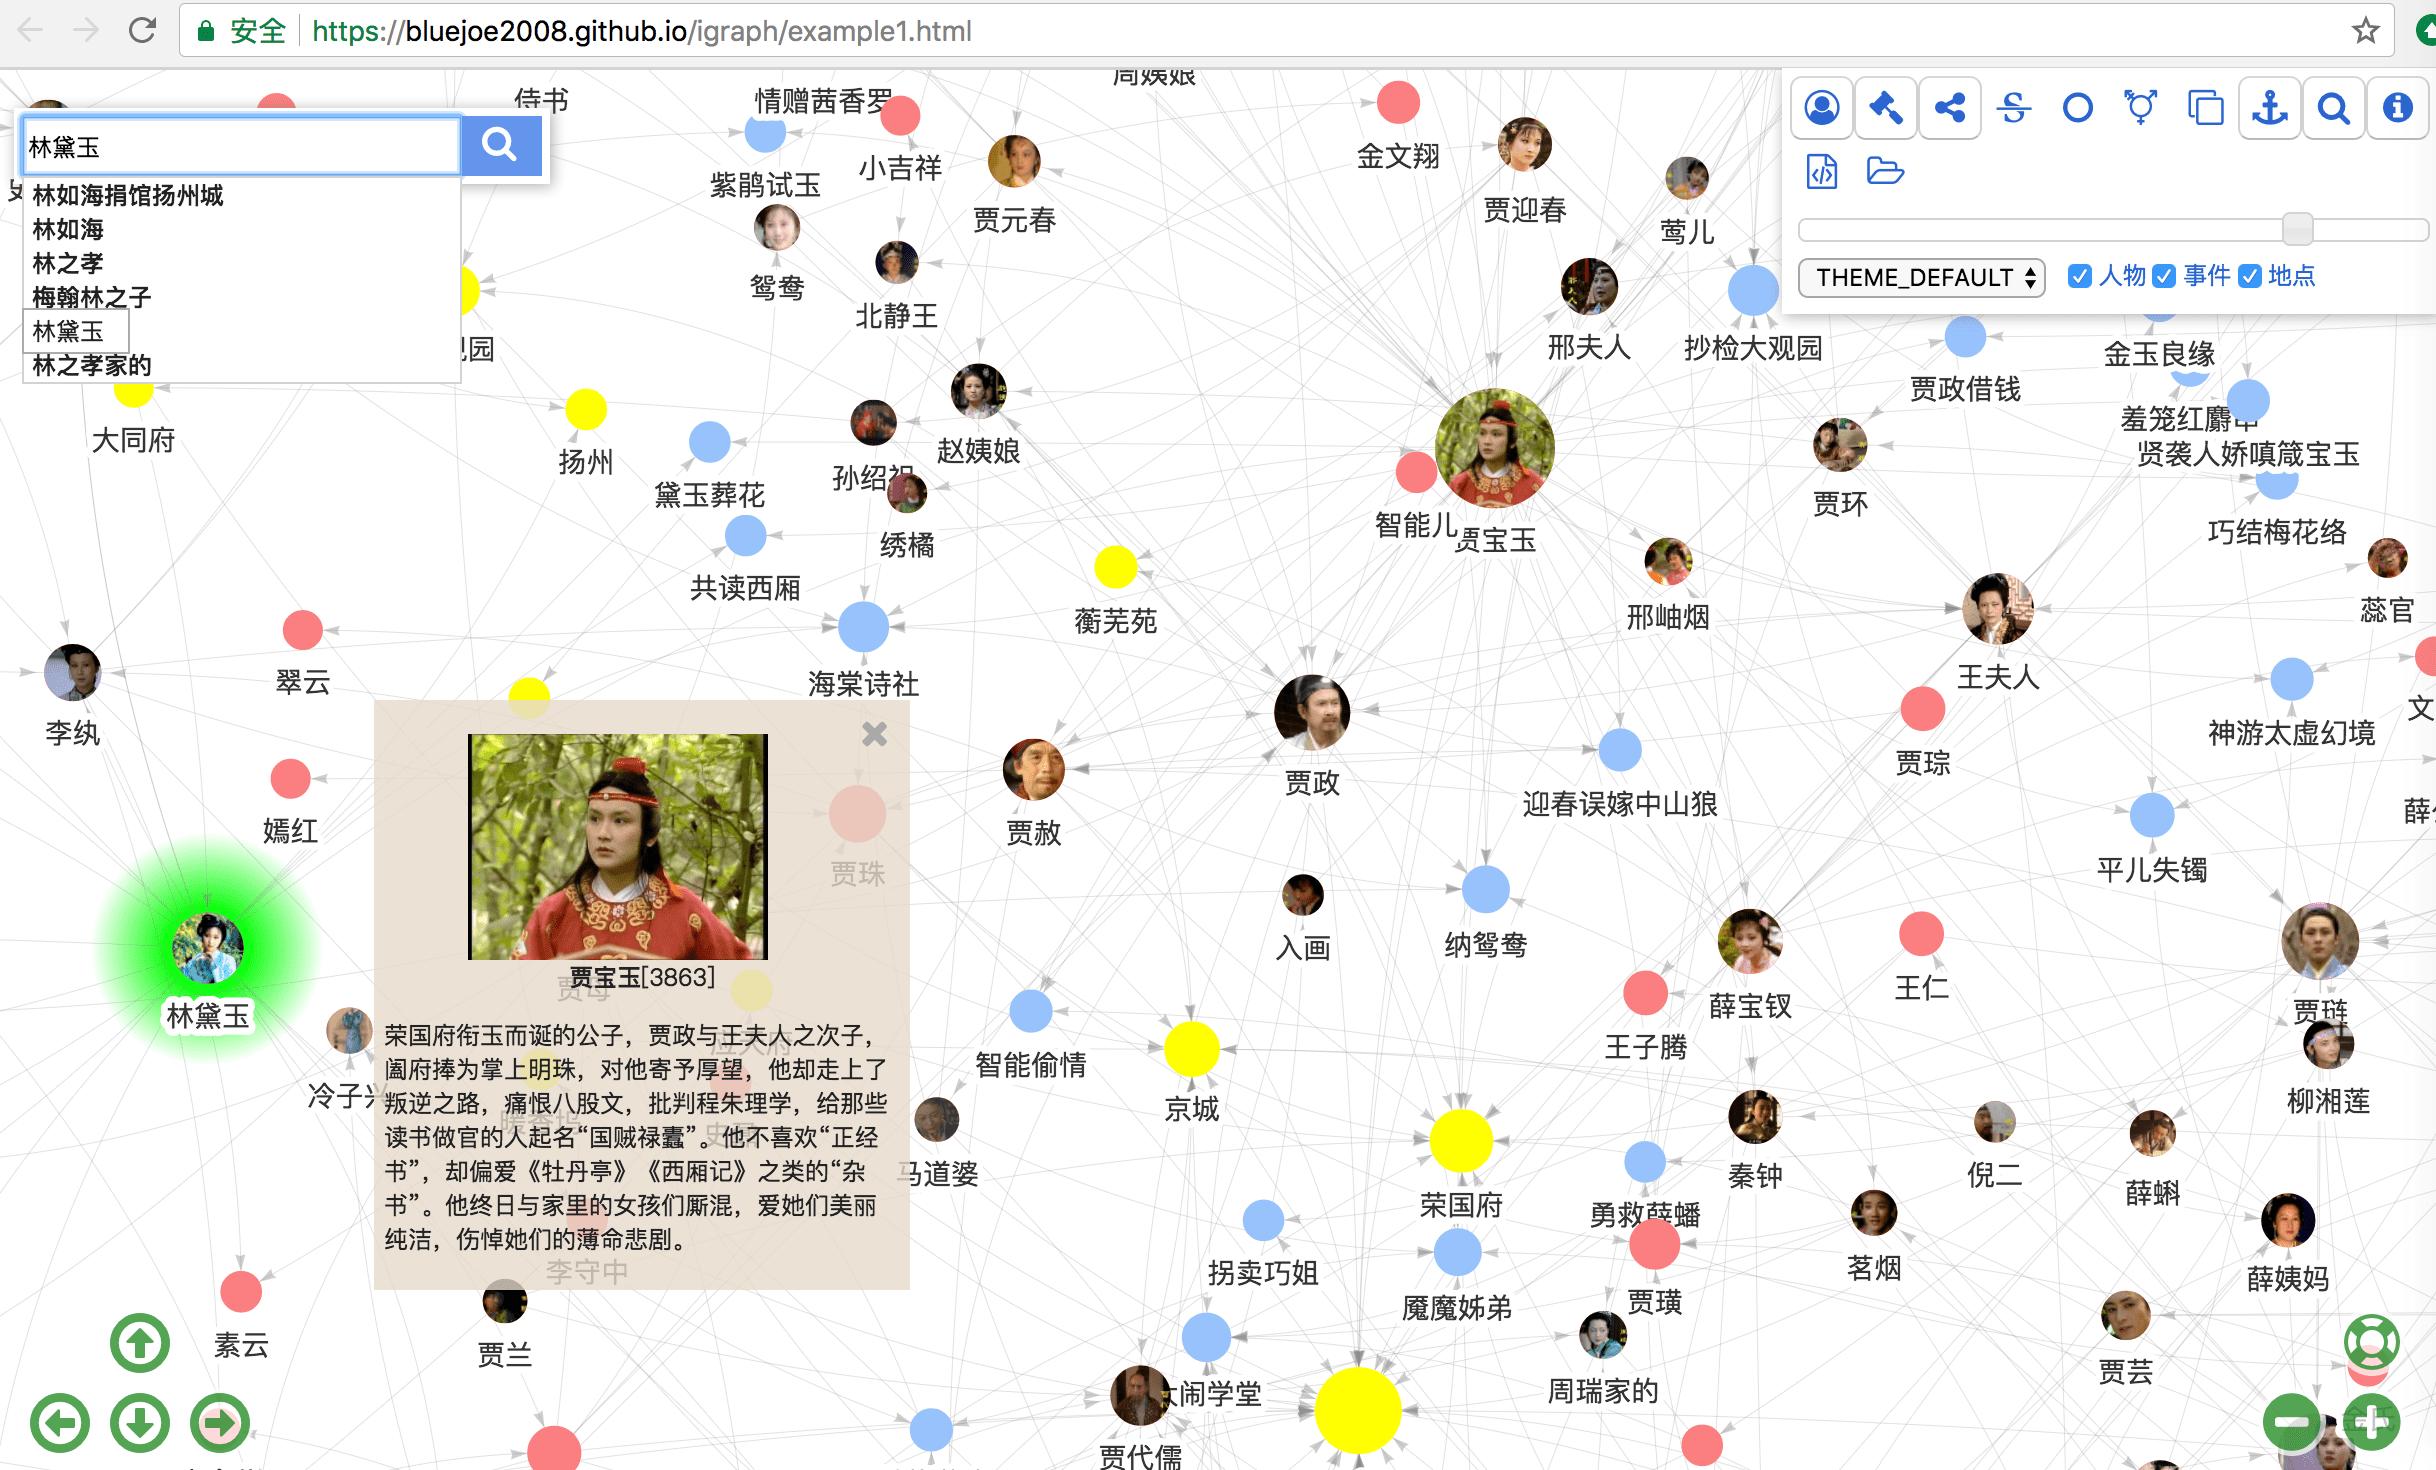 InteractiveGraph